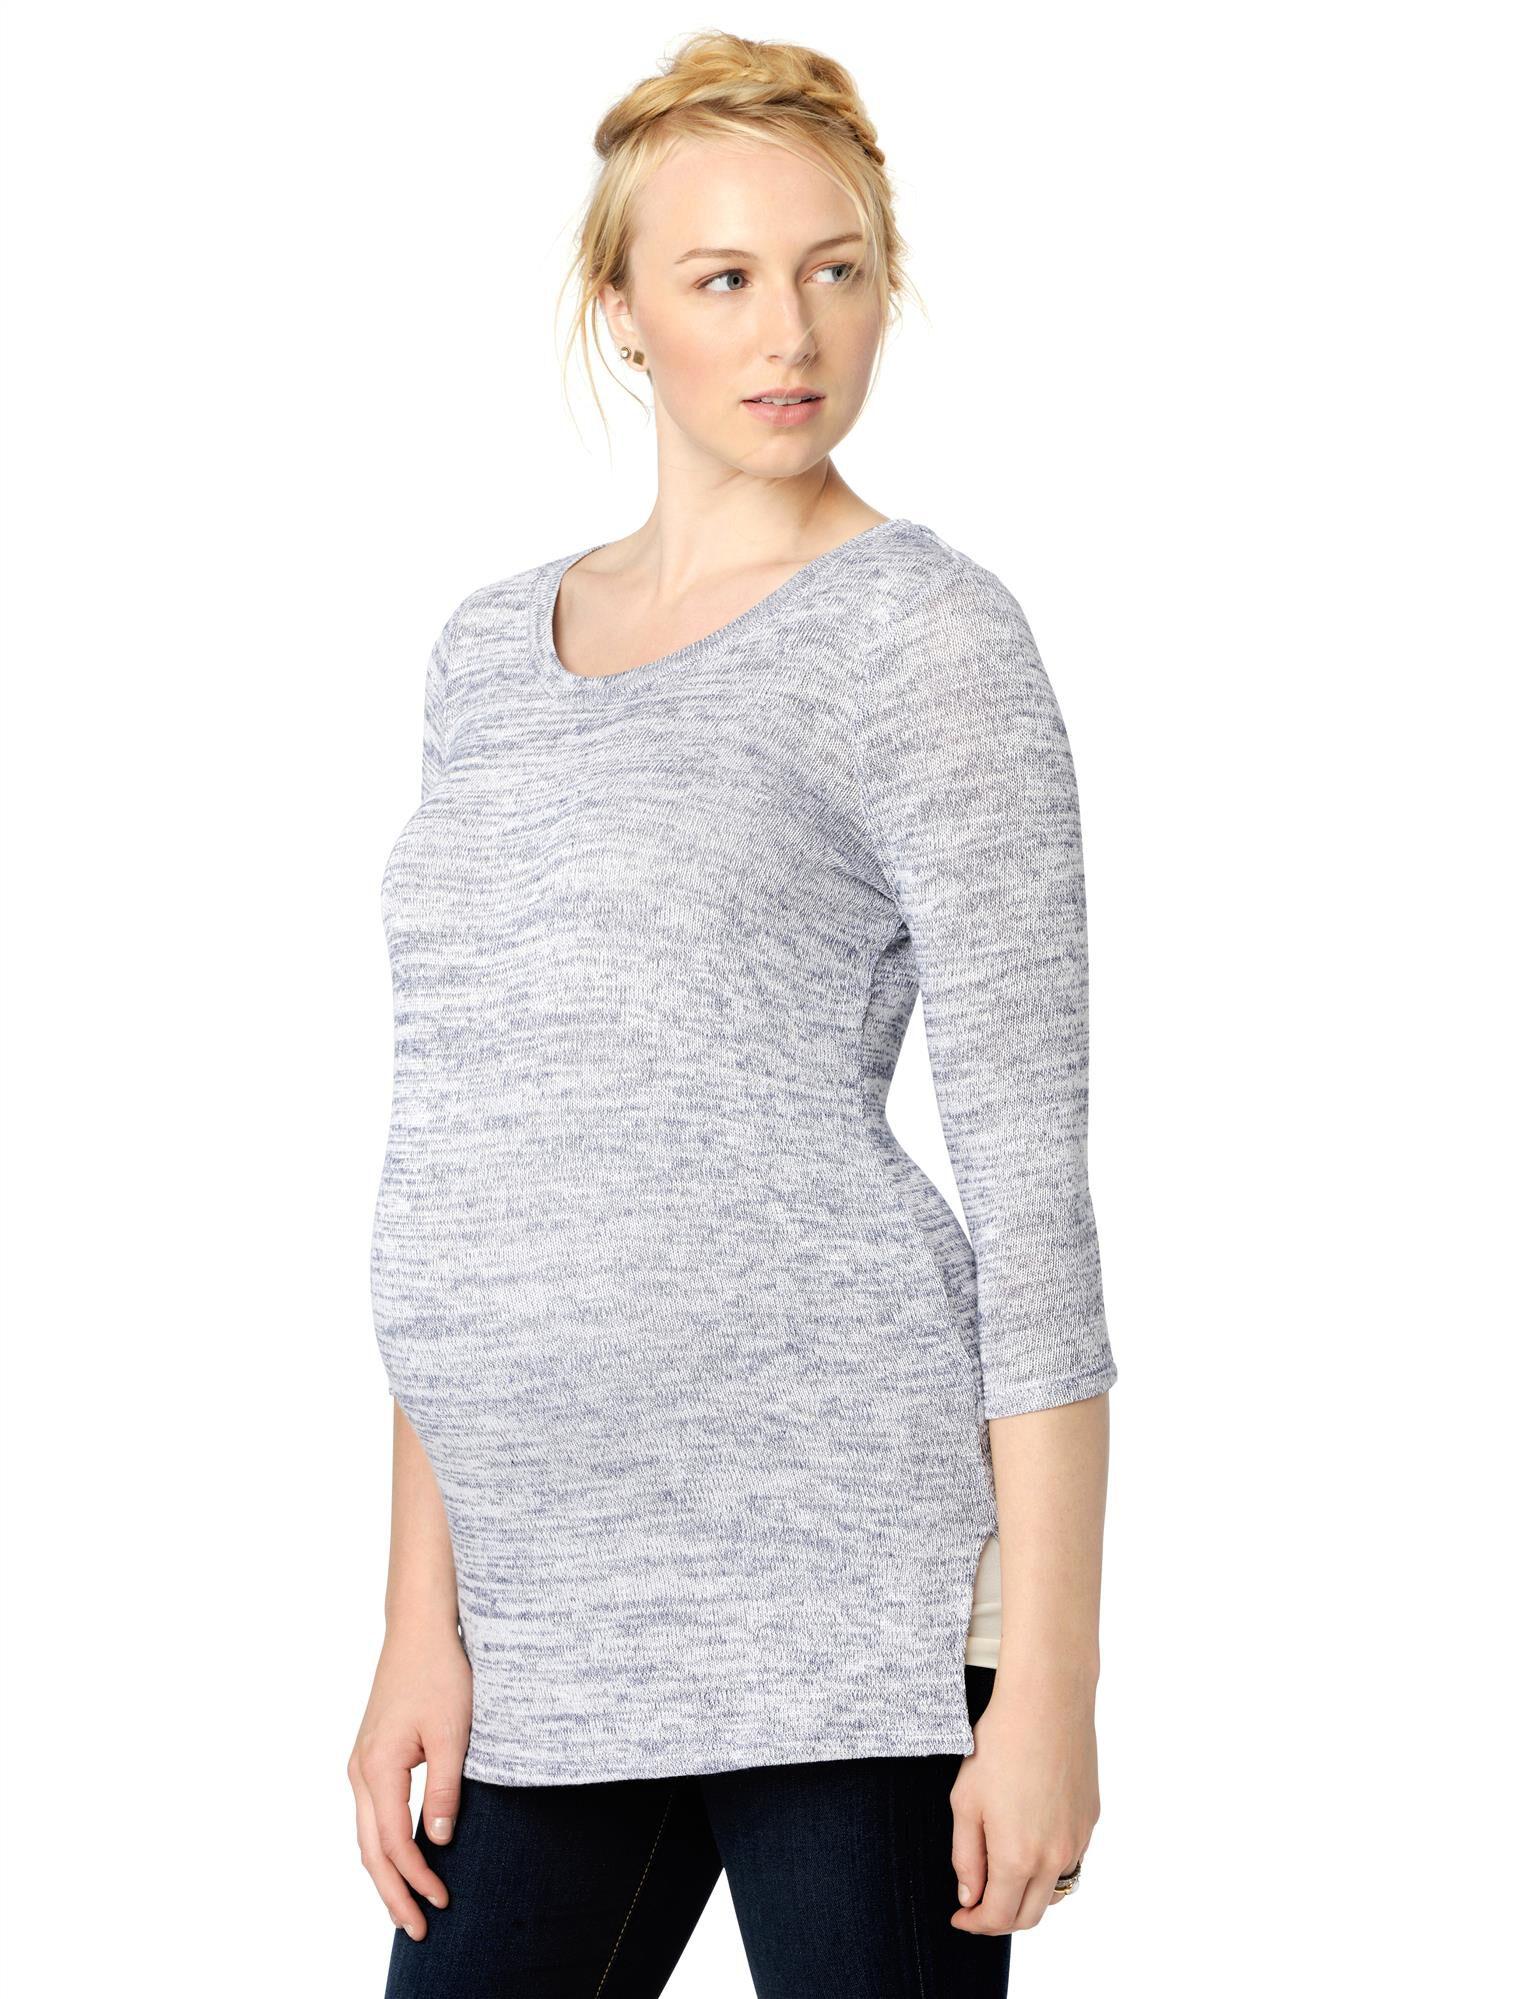 High-low Hem Maternity Sweater